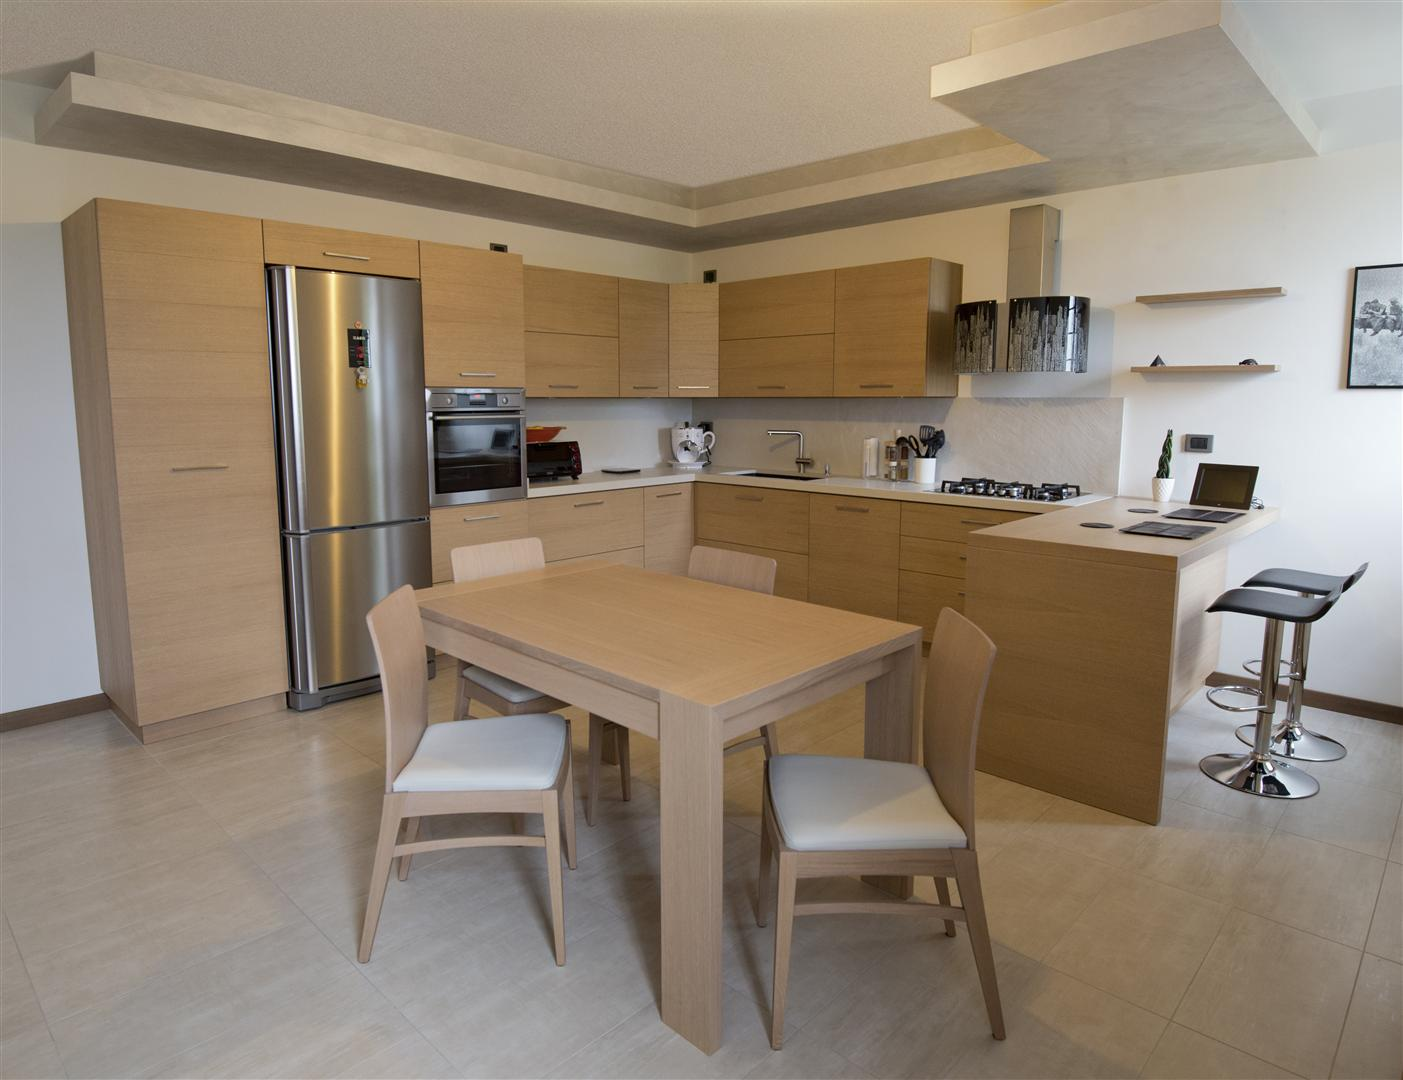 Cucina moderna in rovere spazzolato